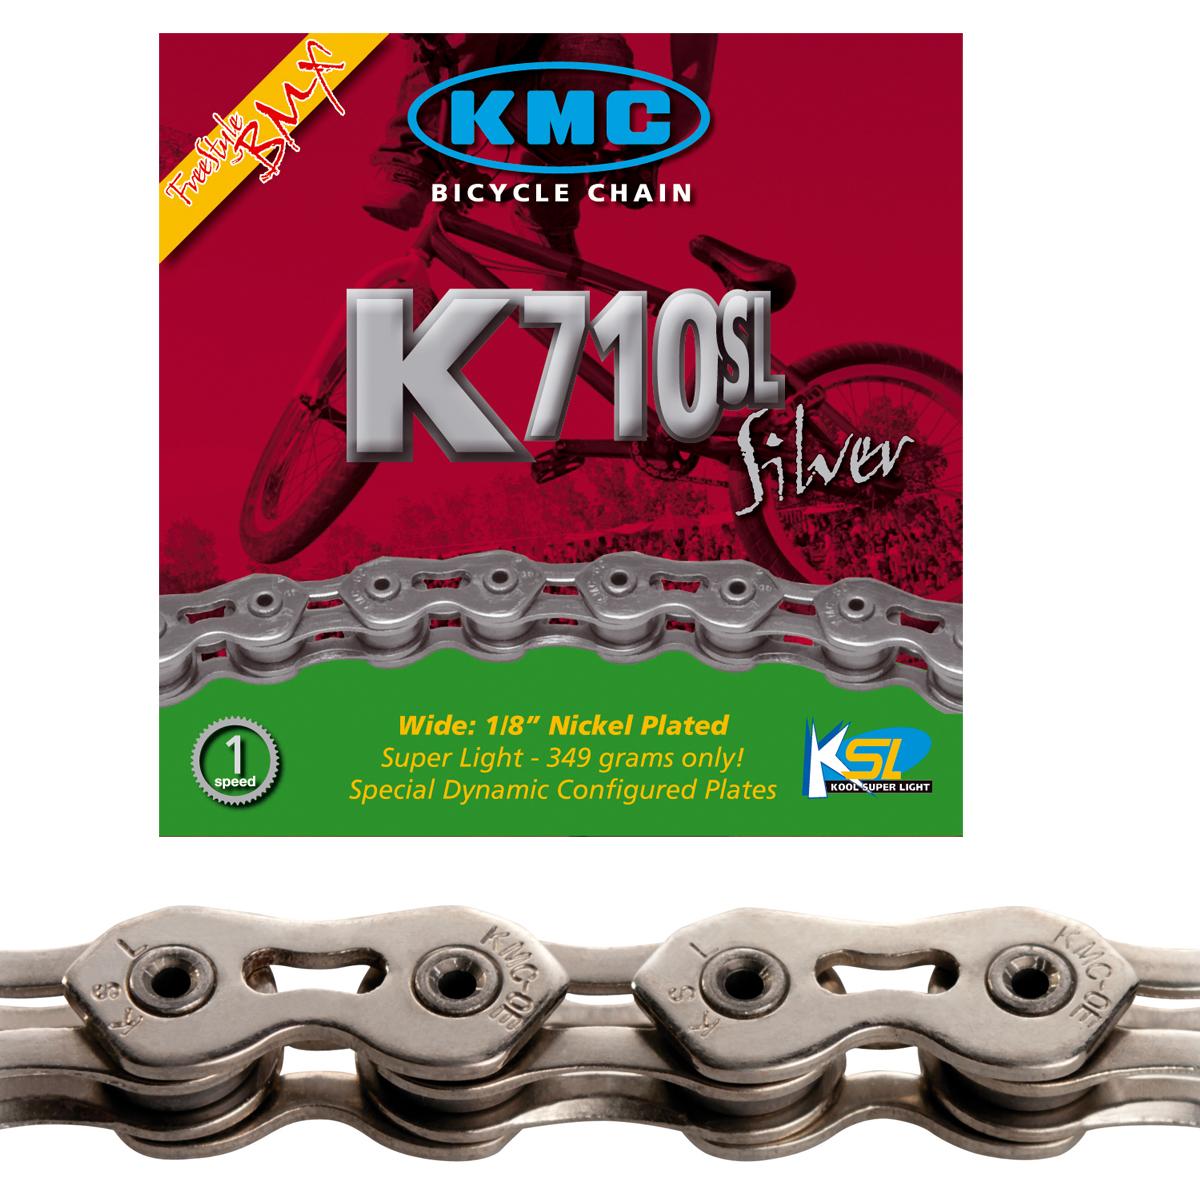 Chaîne KMC BMX K710SL Silver Kool Series 1/8\